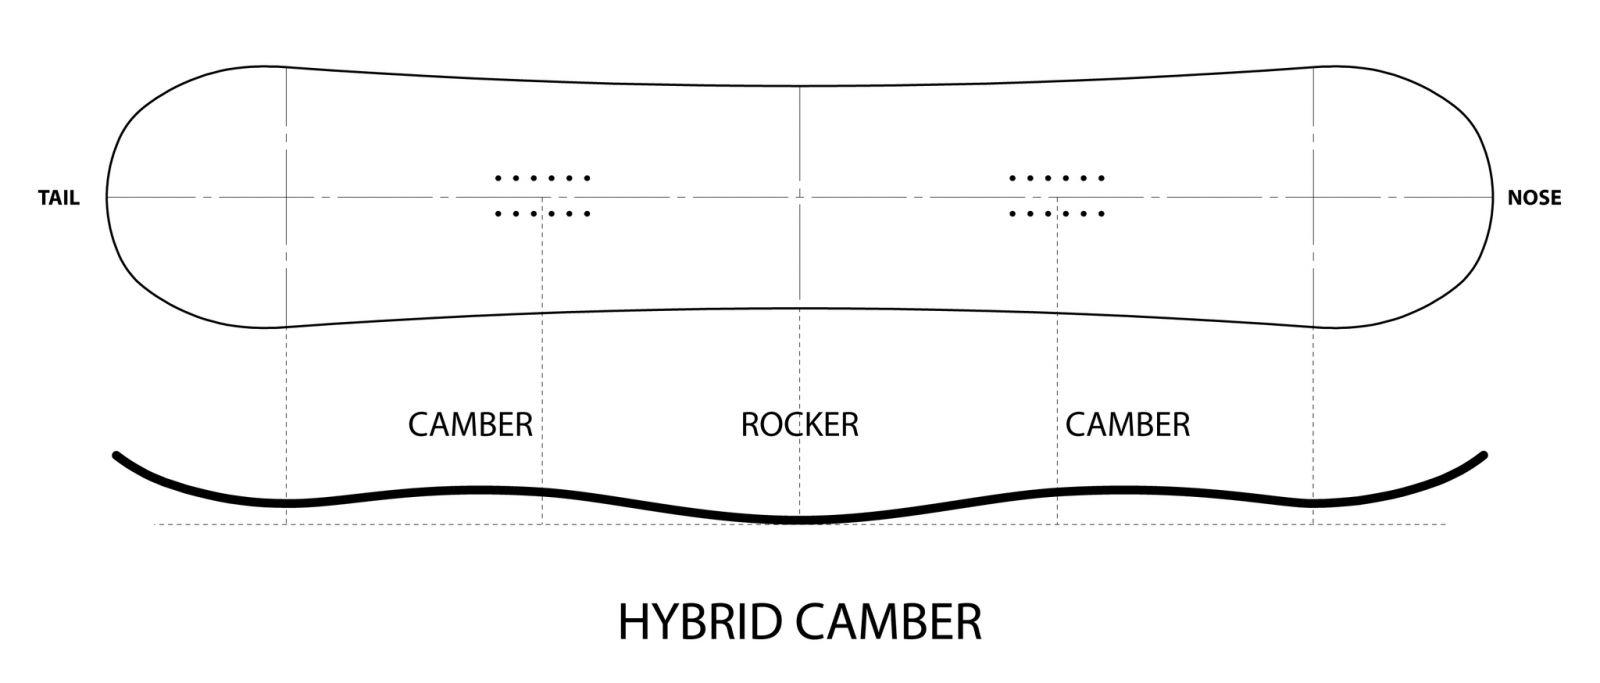 Hybrid Camber